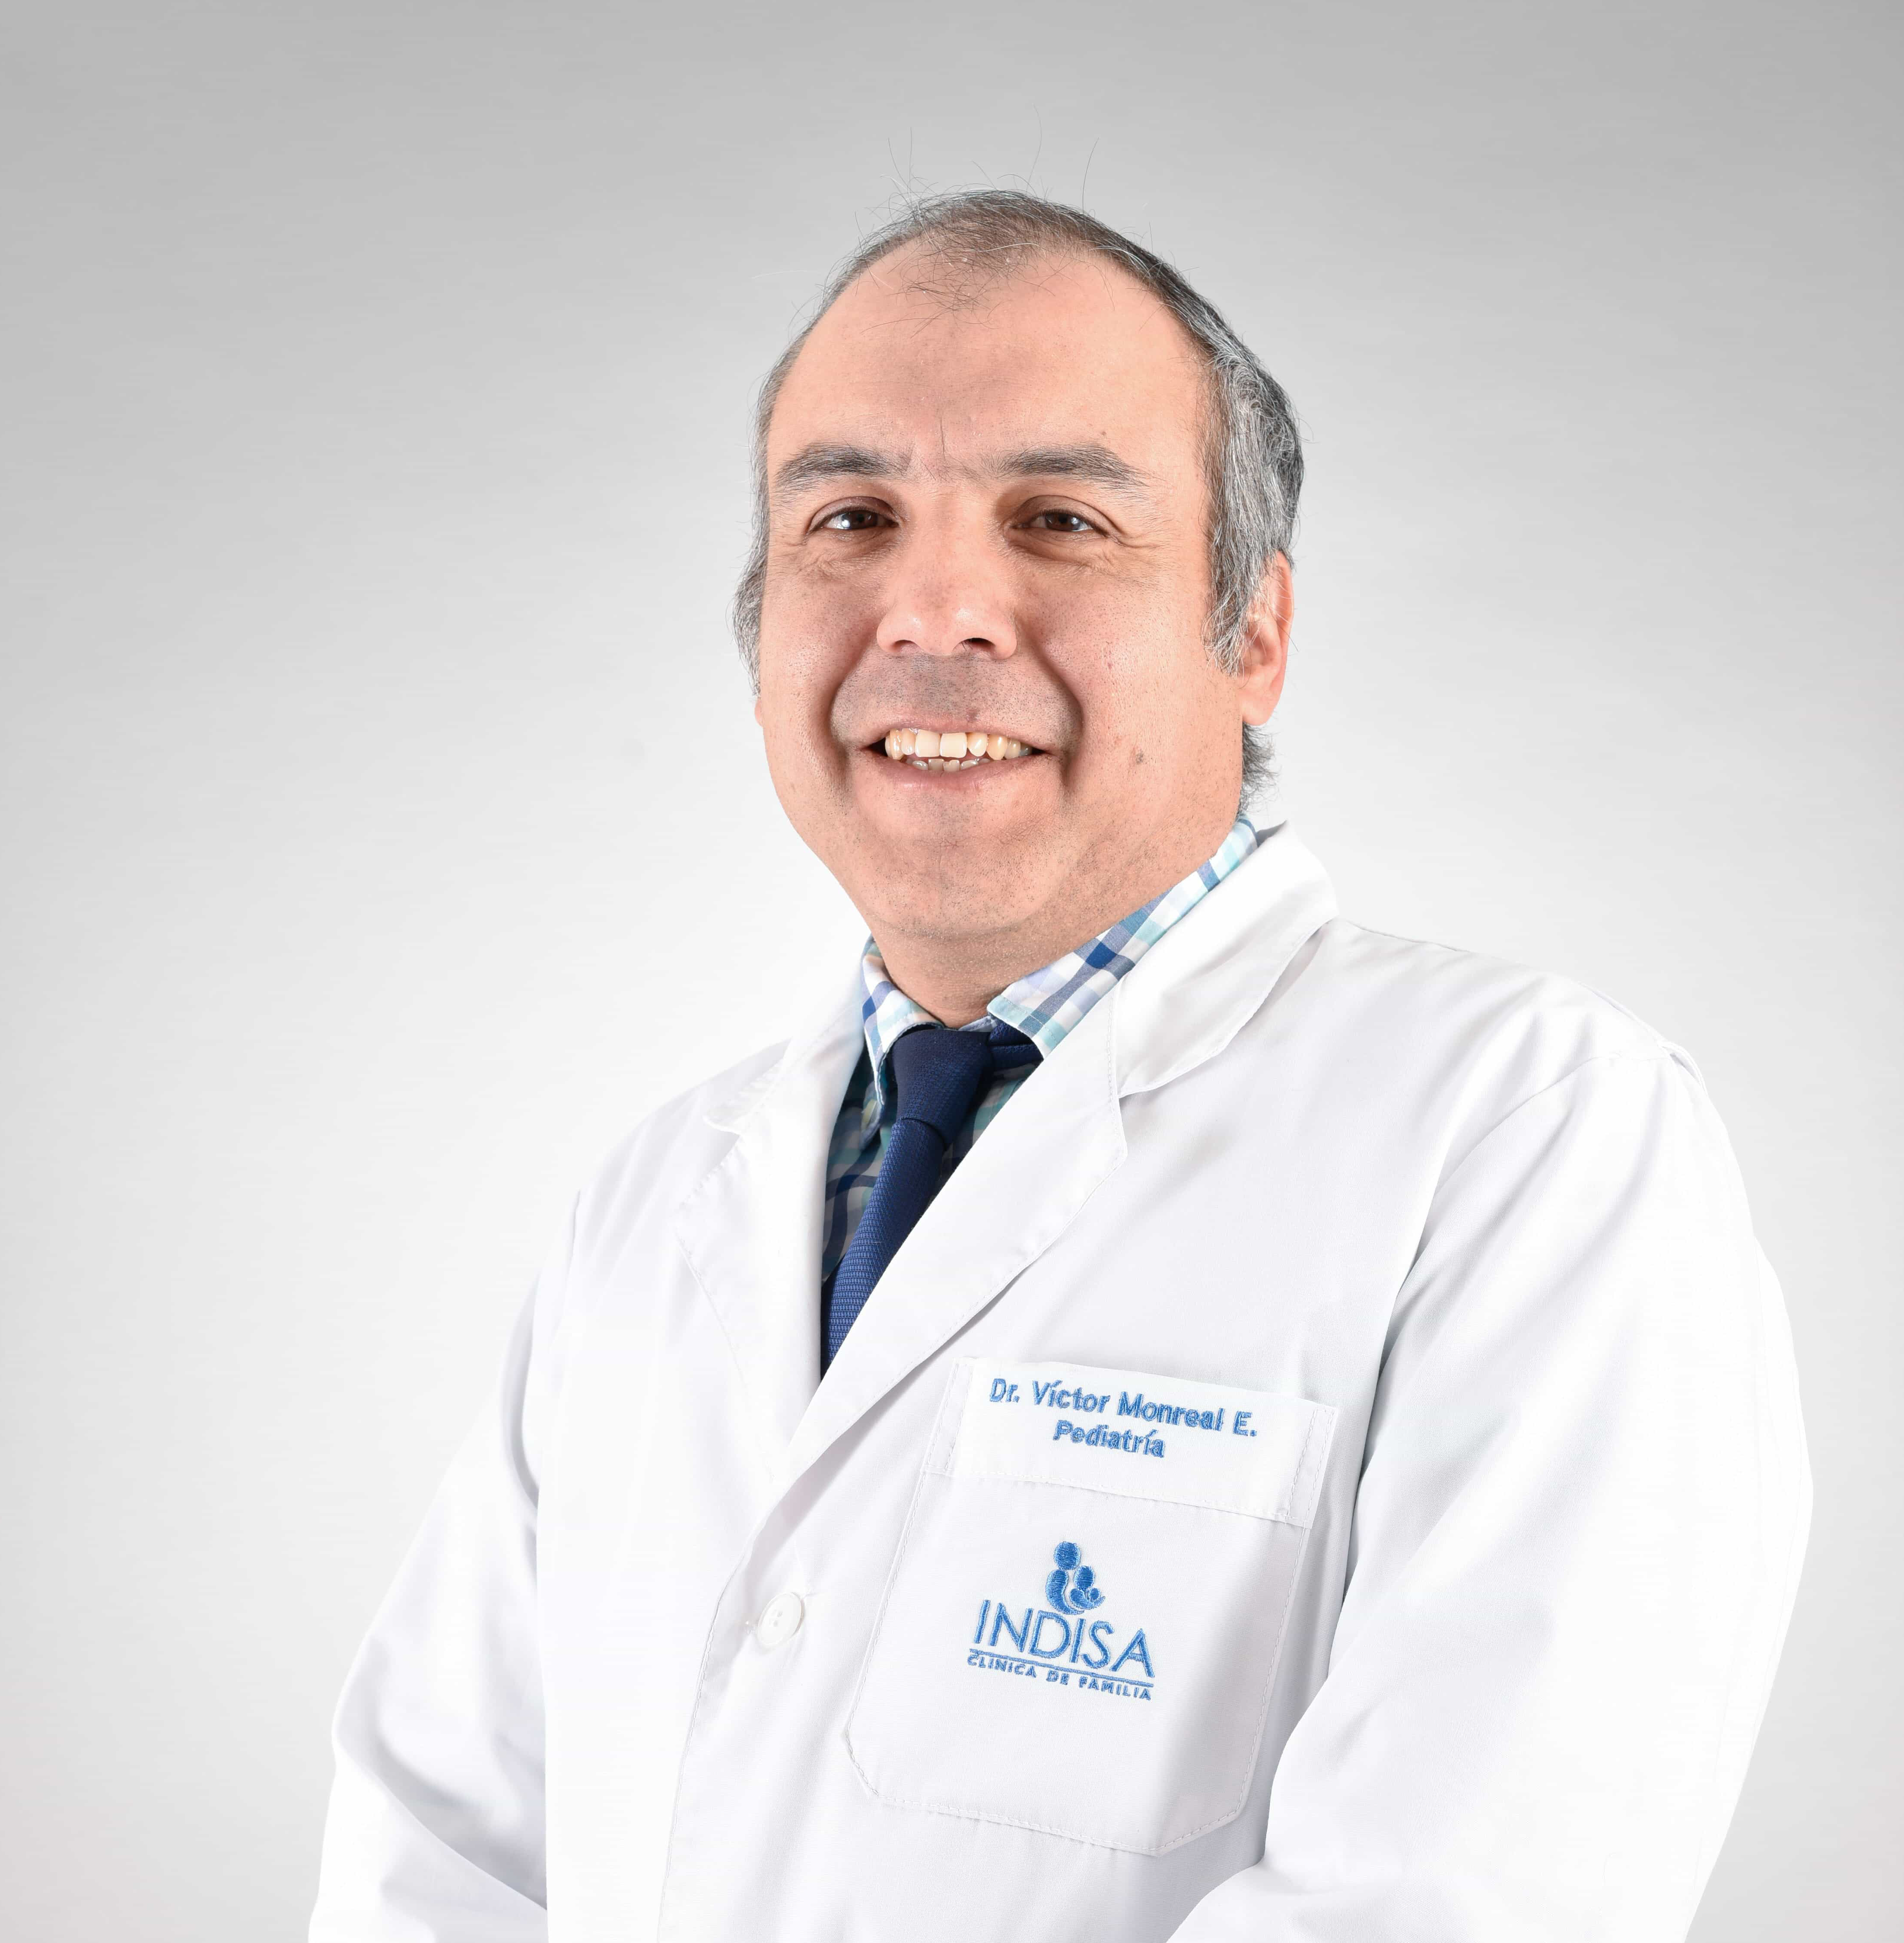 Dr. Víctor Monreal